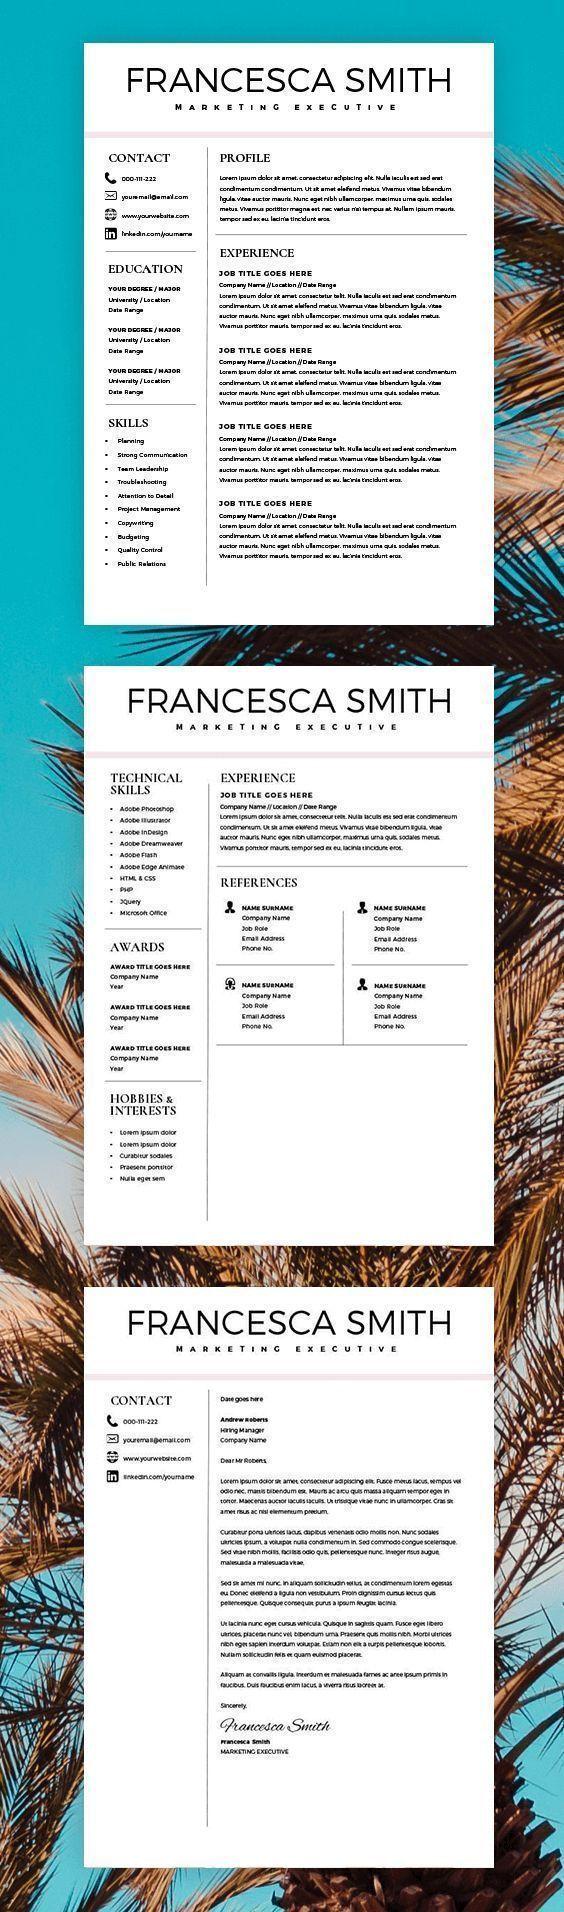 Microsoft Word Resume Template For Mac Fascinating Feminine Resume  Cv Design  Resume Download  Ms Word Resume For .